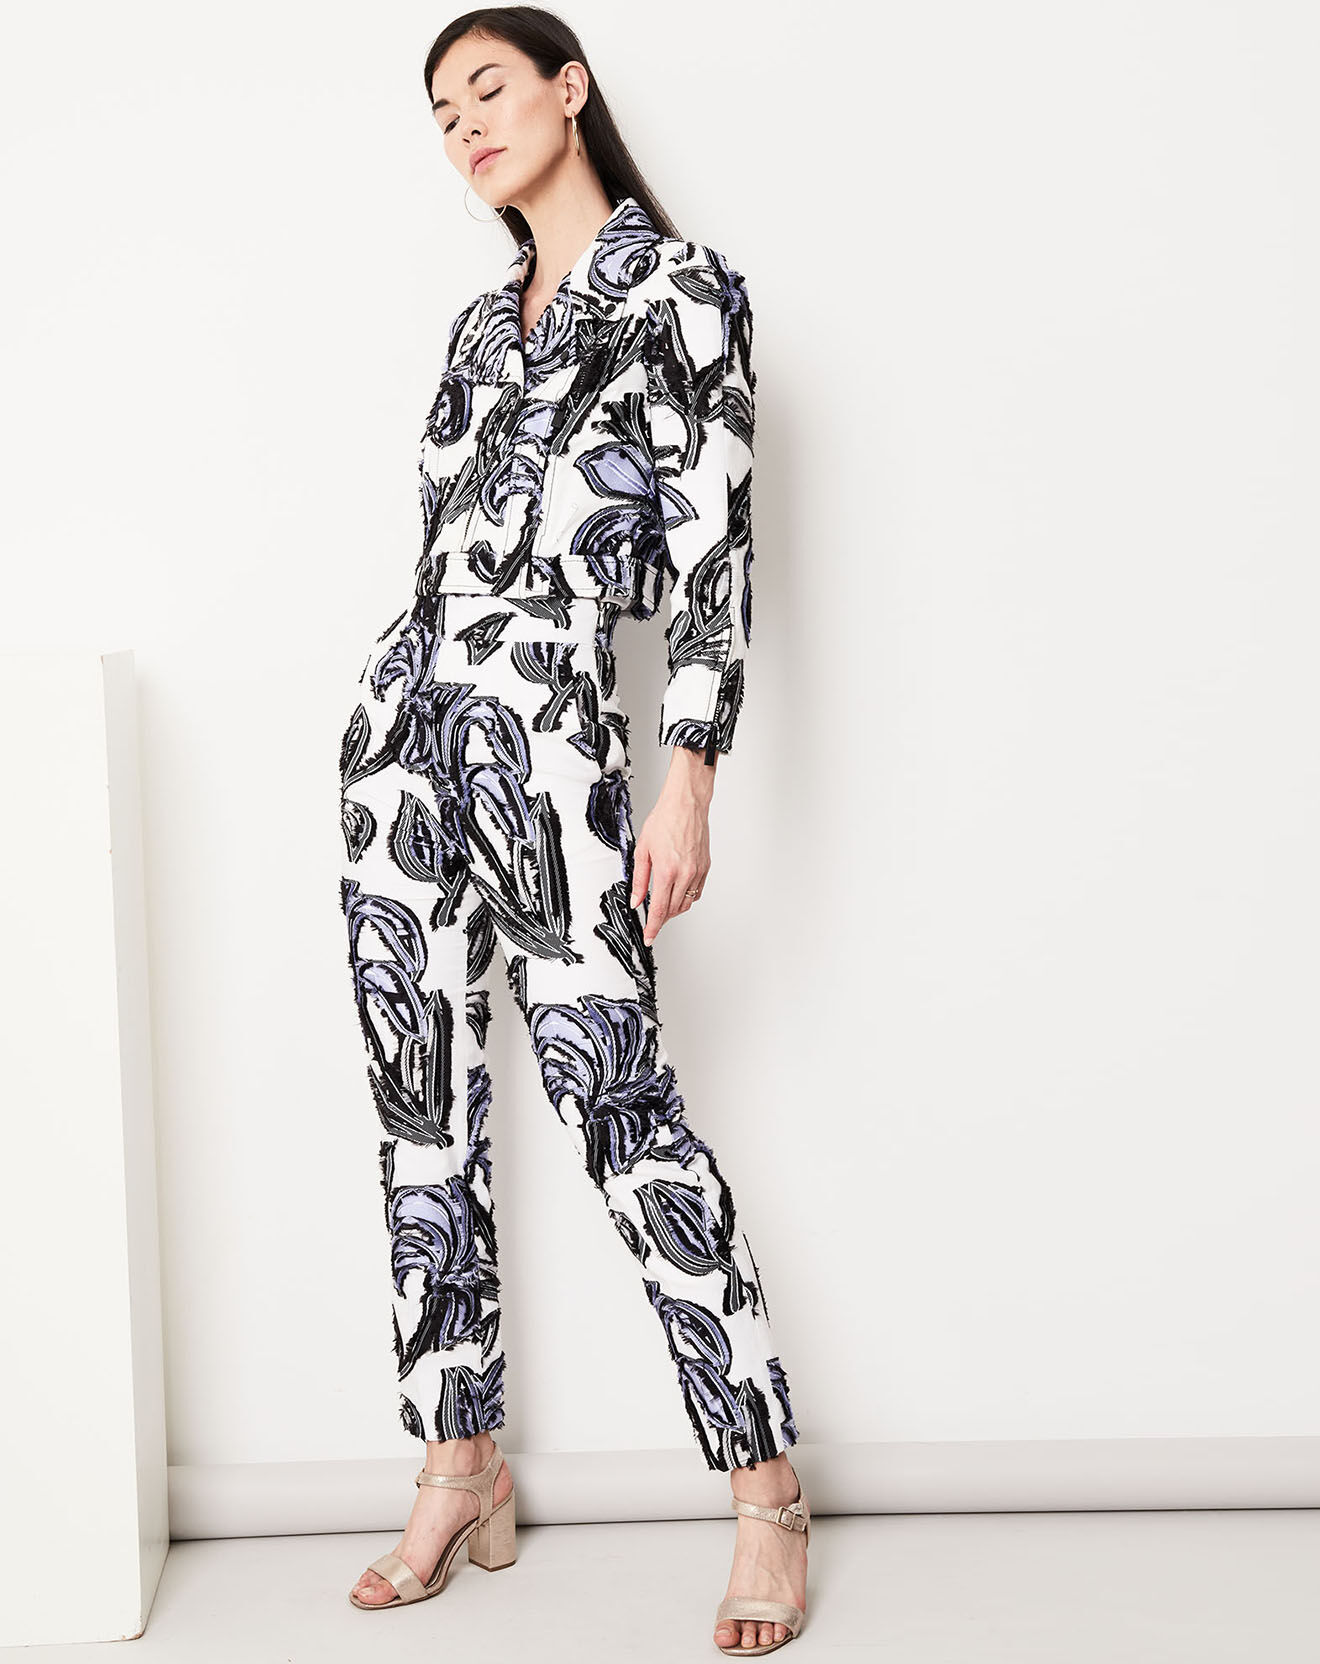 Pantalon Cléa à motifs blanc/lavande/noir - Paule ka - Modalova